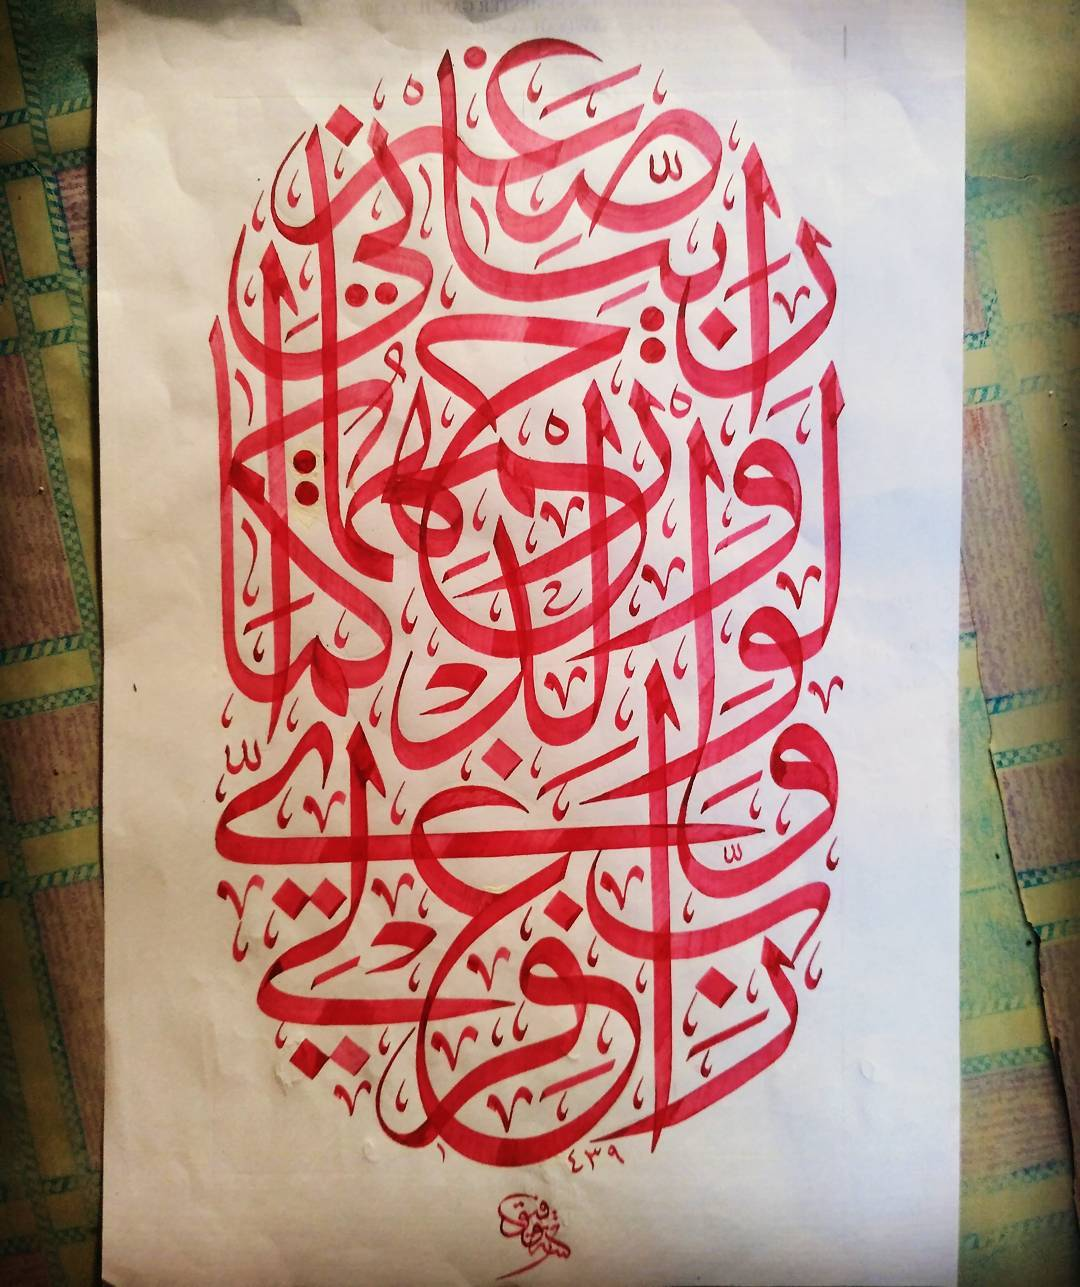 Works Calligraphy Taufik Hasibuan رب اغفرلي ولوالدي وارحمهما كما ربياني صغيرا... 102 1